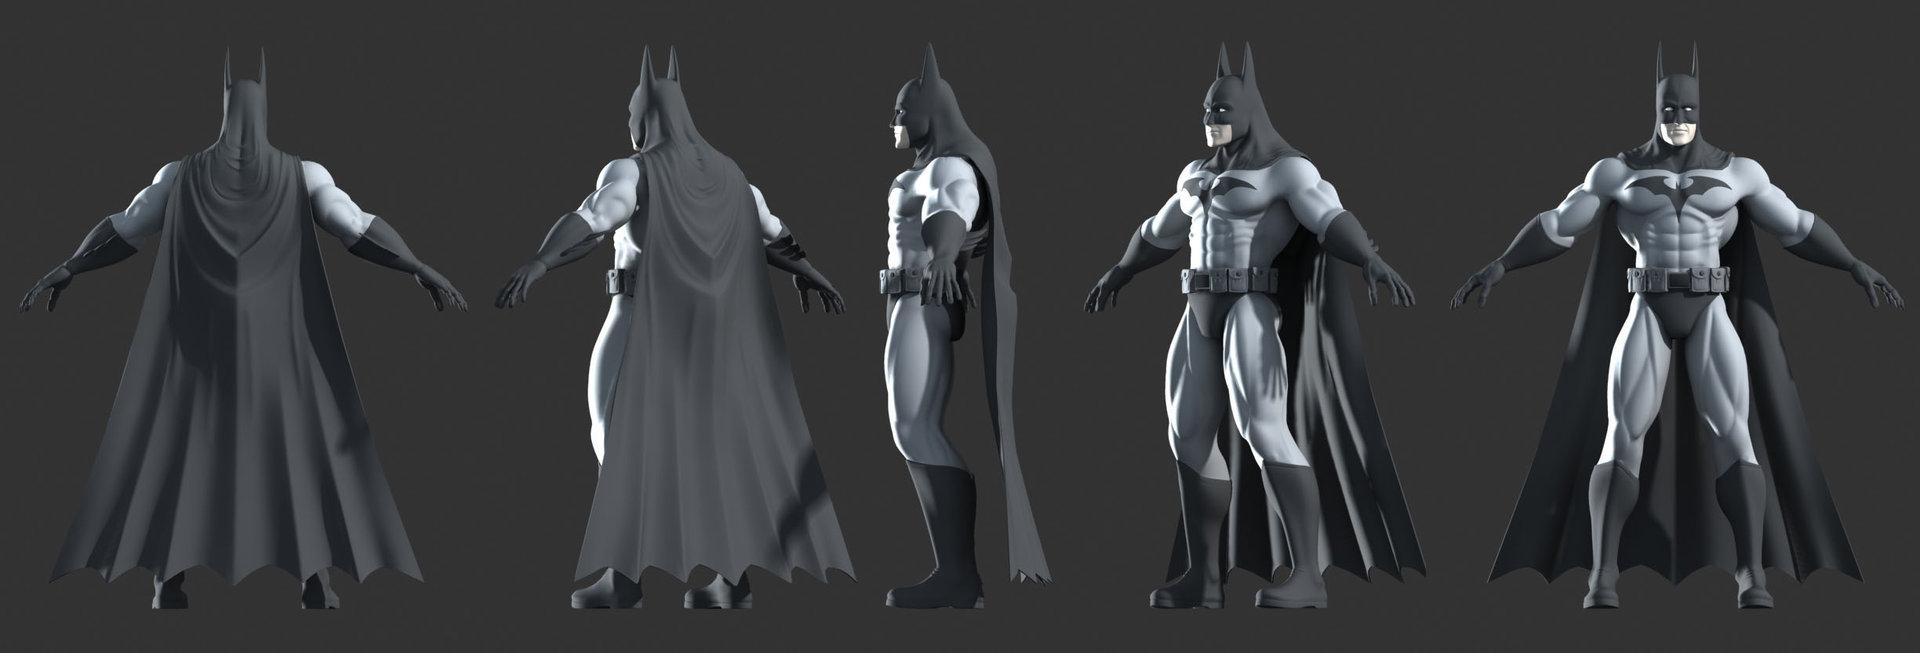 Mark van haitsma batman model final views